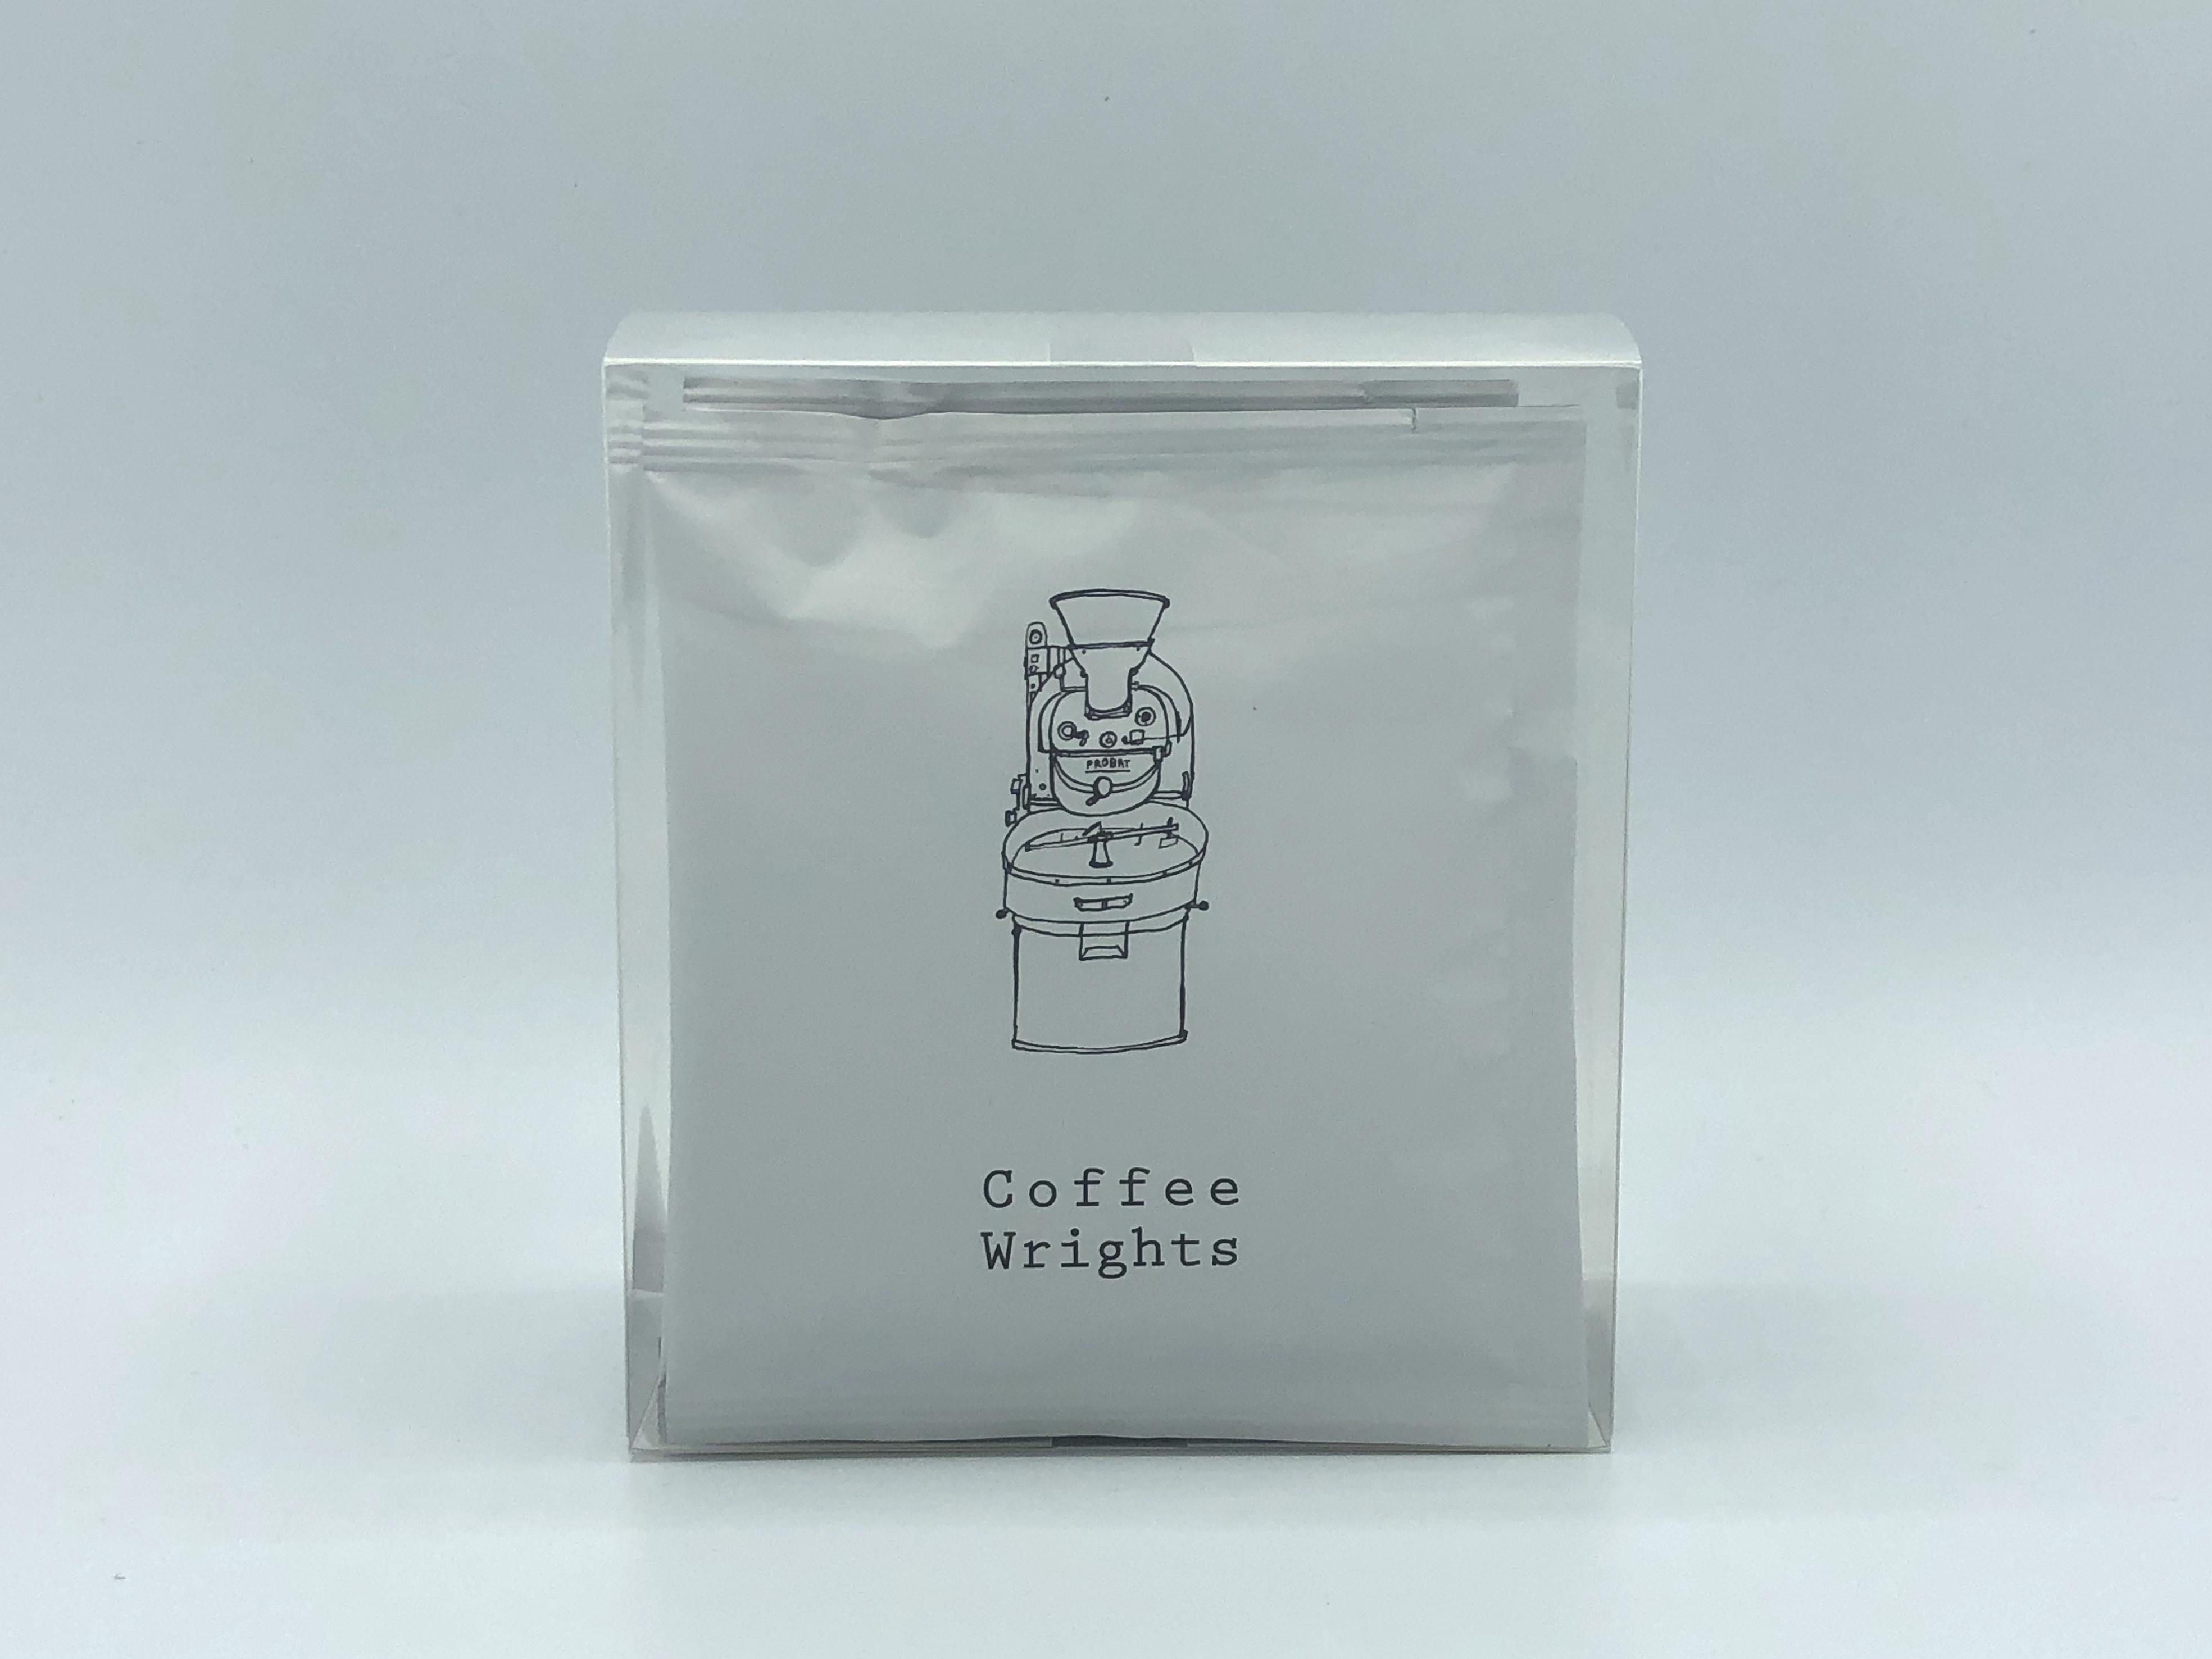 【12g×6個】ドリップバッグ・クリアケース入り / Drip Bag Box - Ampere Blend -